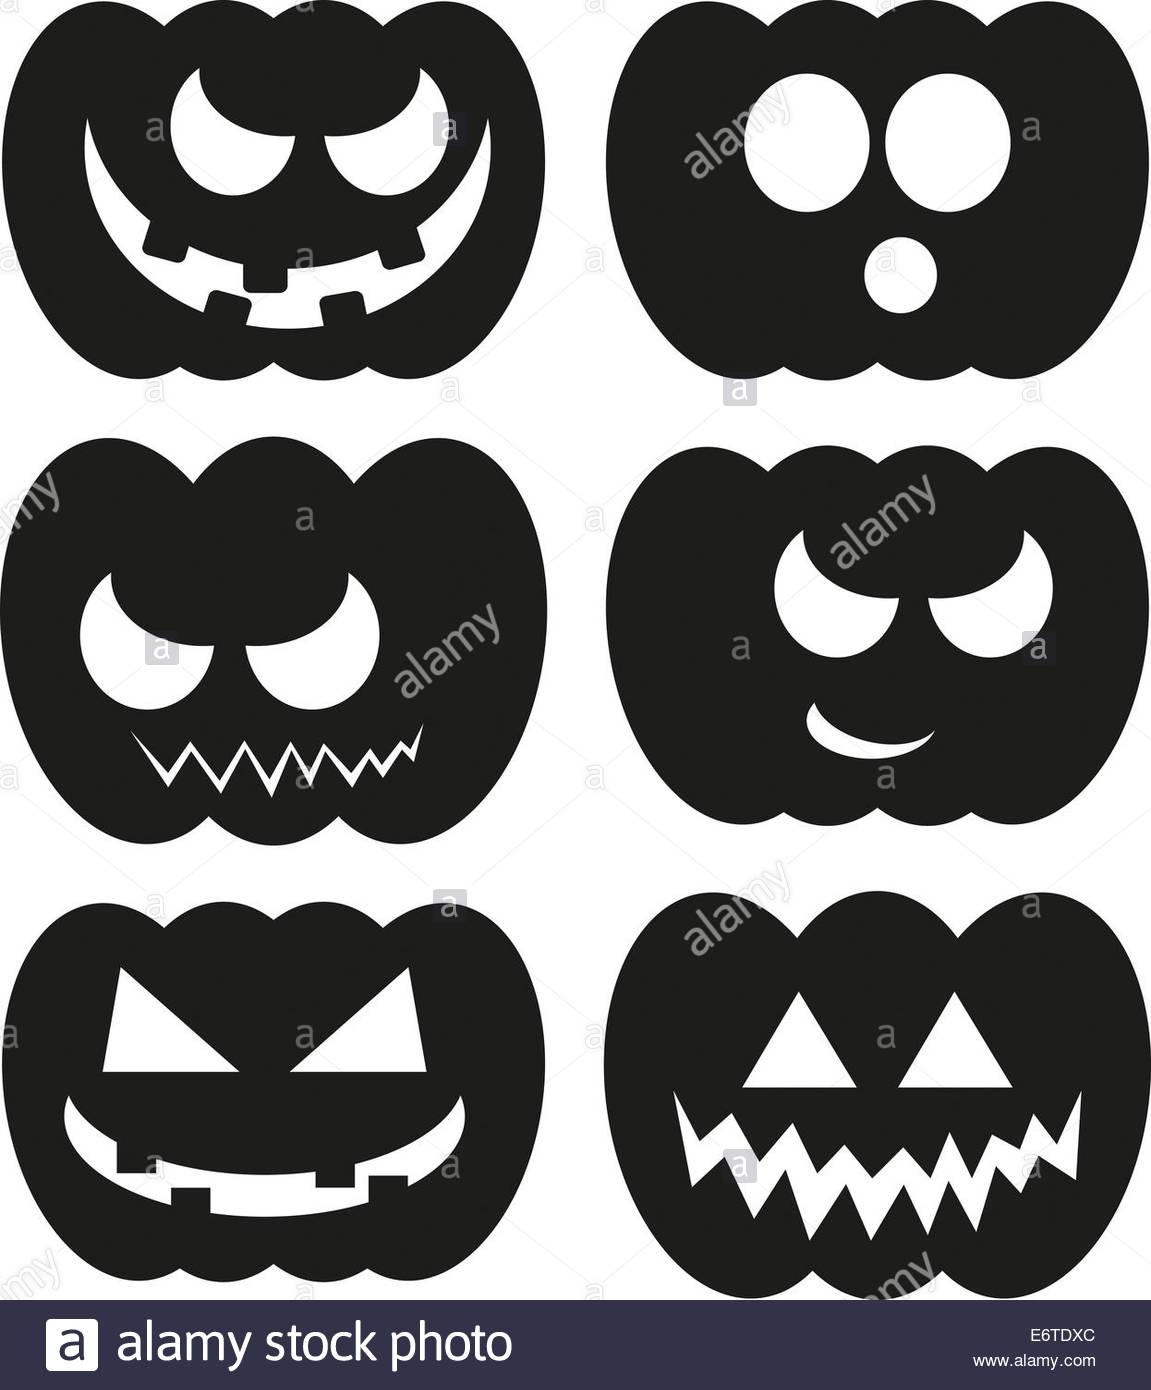 Halloween Kuerbis Kuerbisse Gesichter Ausdruck Gesichtsausdruck.